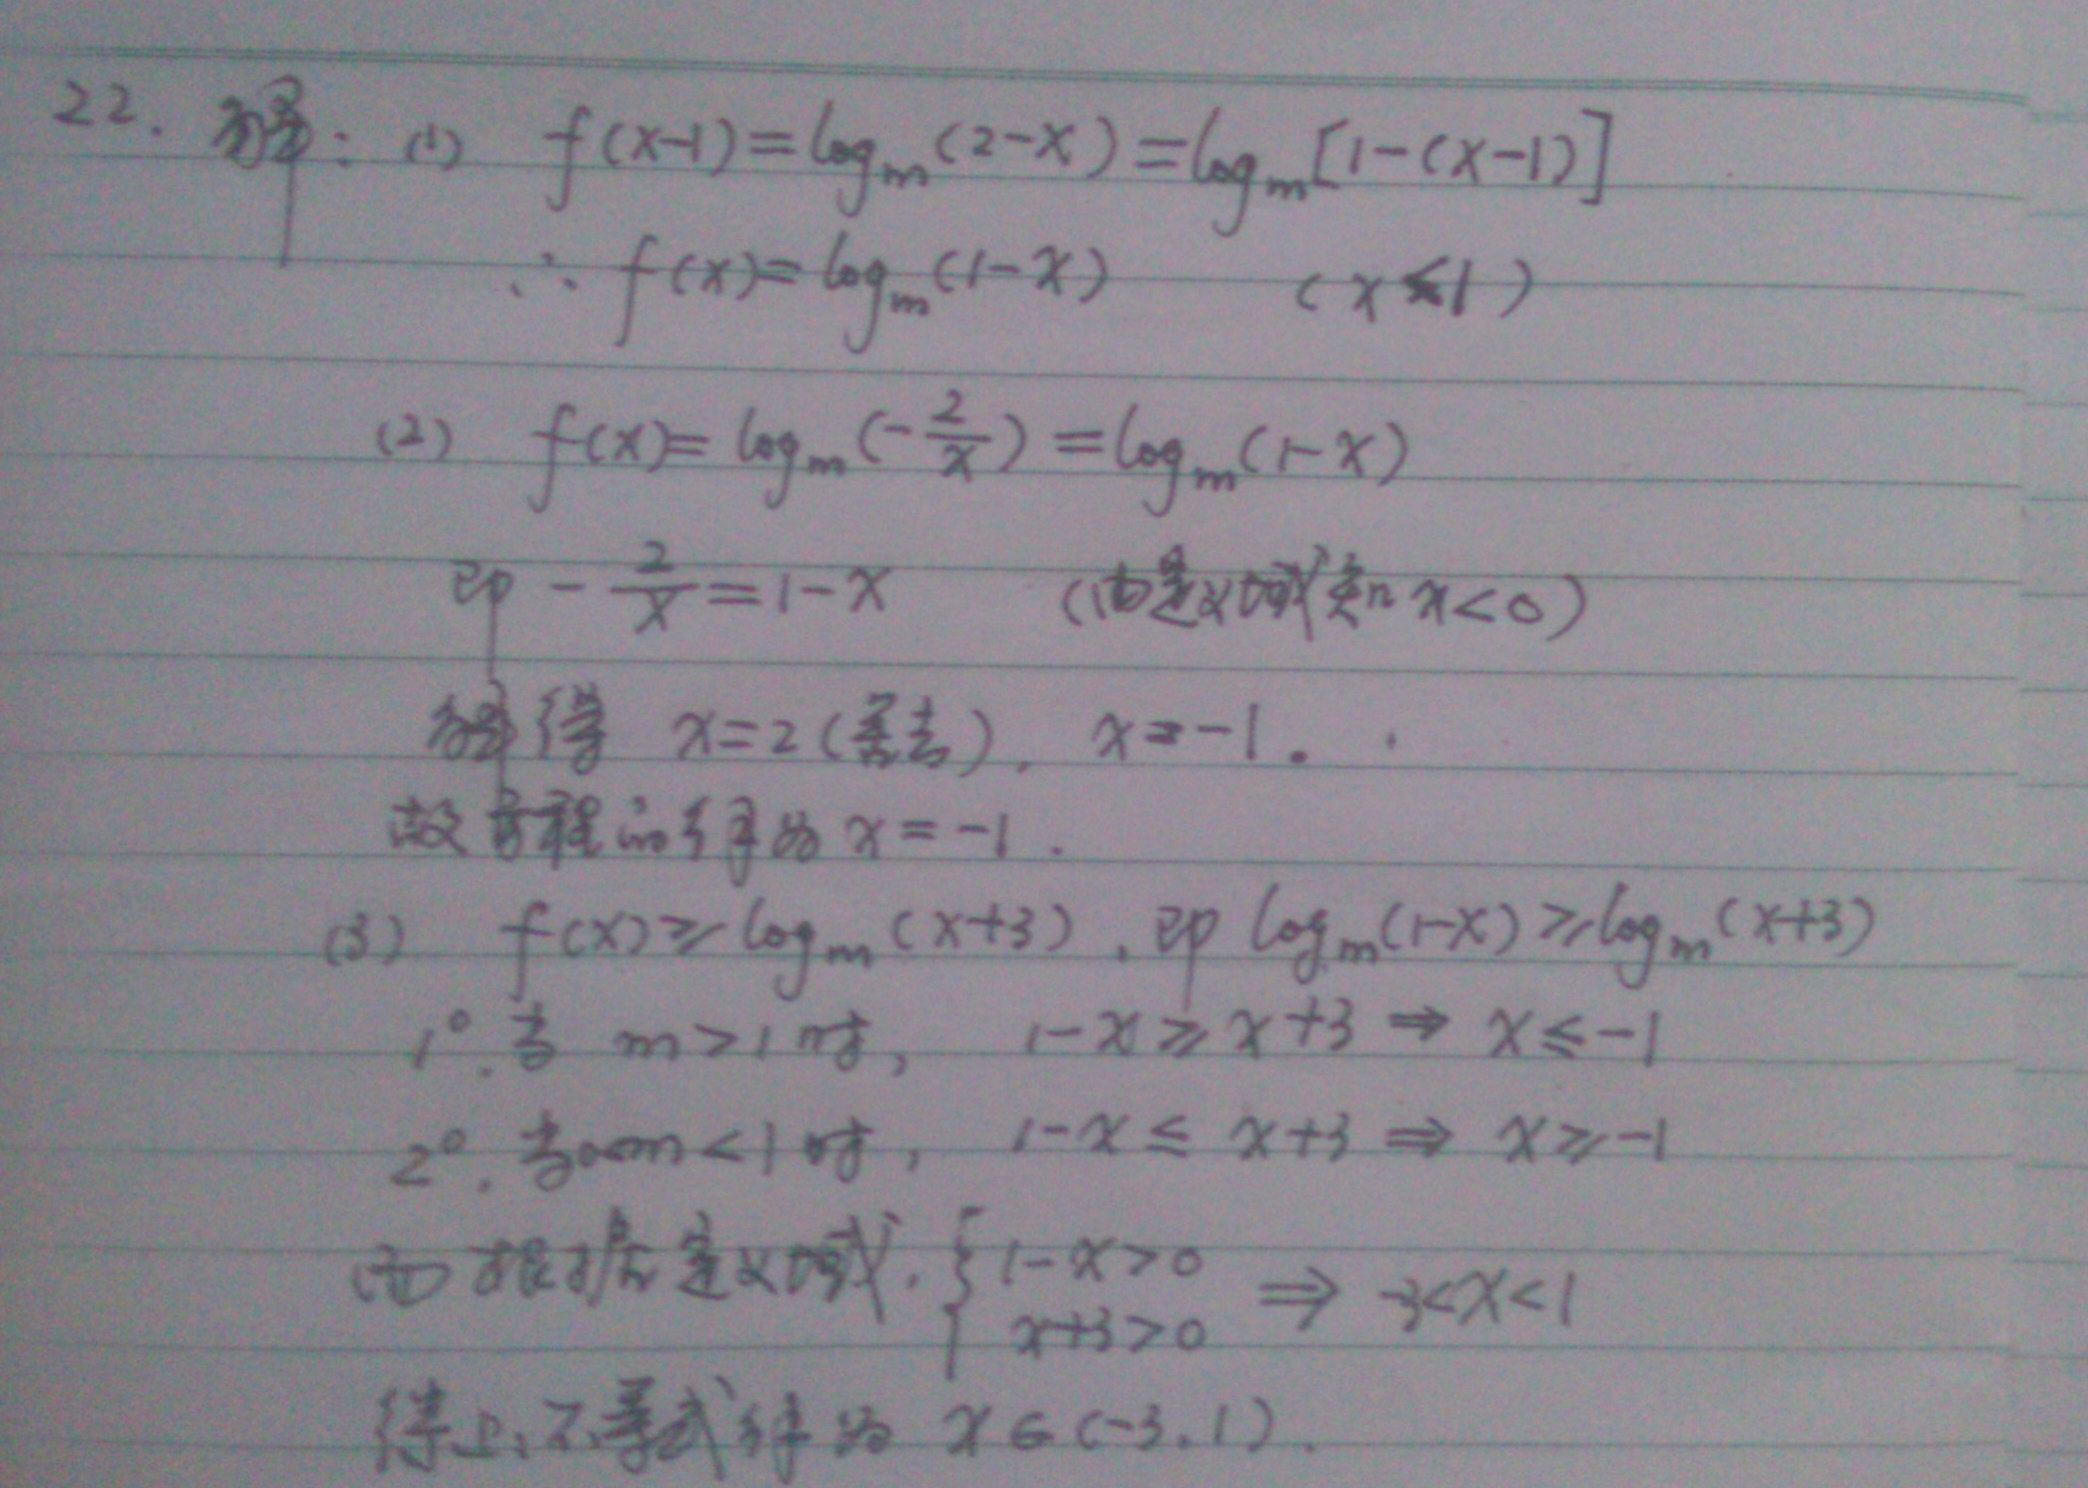 logm��a�Y��i�����_(1)f(x)=logm(1-x)